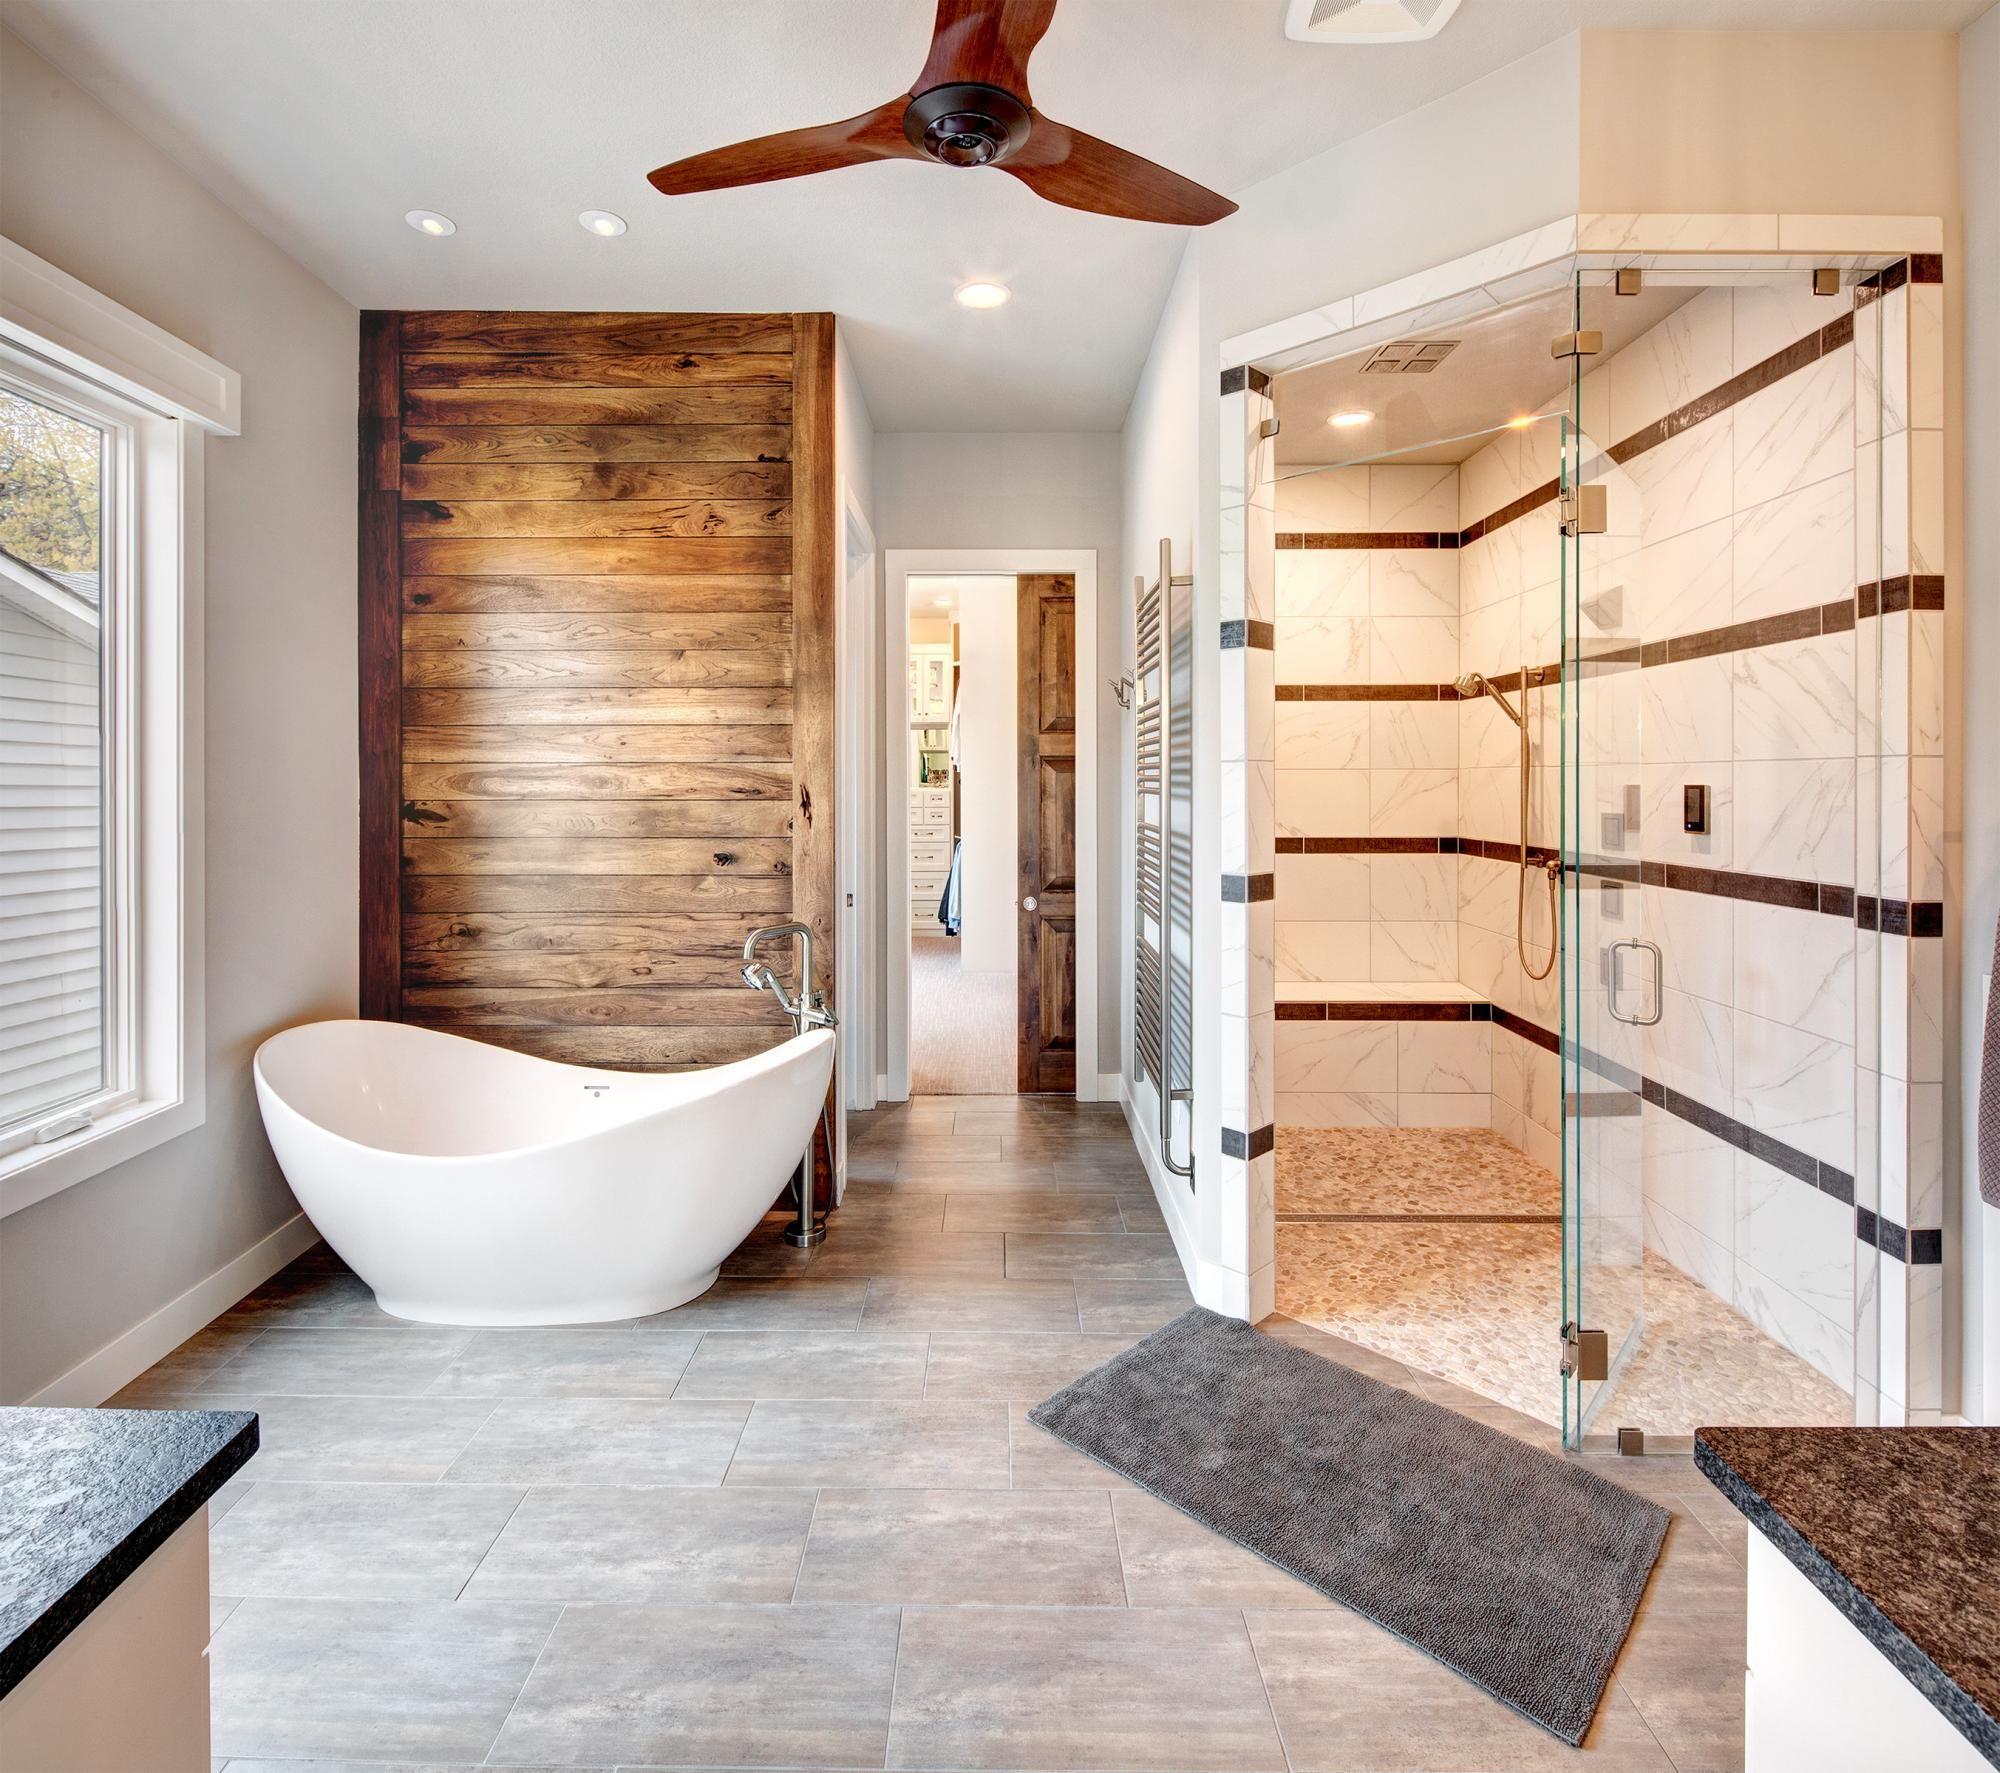 Bathrooms Photo Gallery Custom Homes In Kansas City Ks Starr Homes Lakeside Cottage Adair Homes Bathroom Remodel Master [ jpg ]